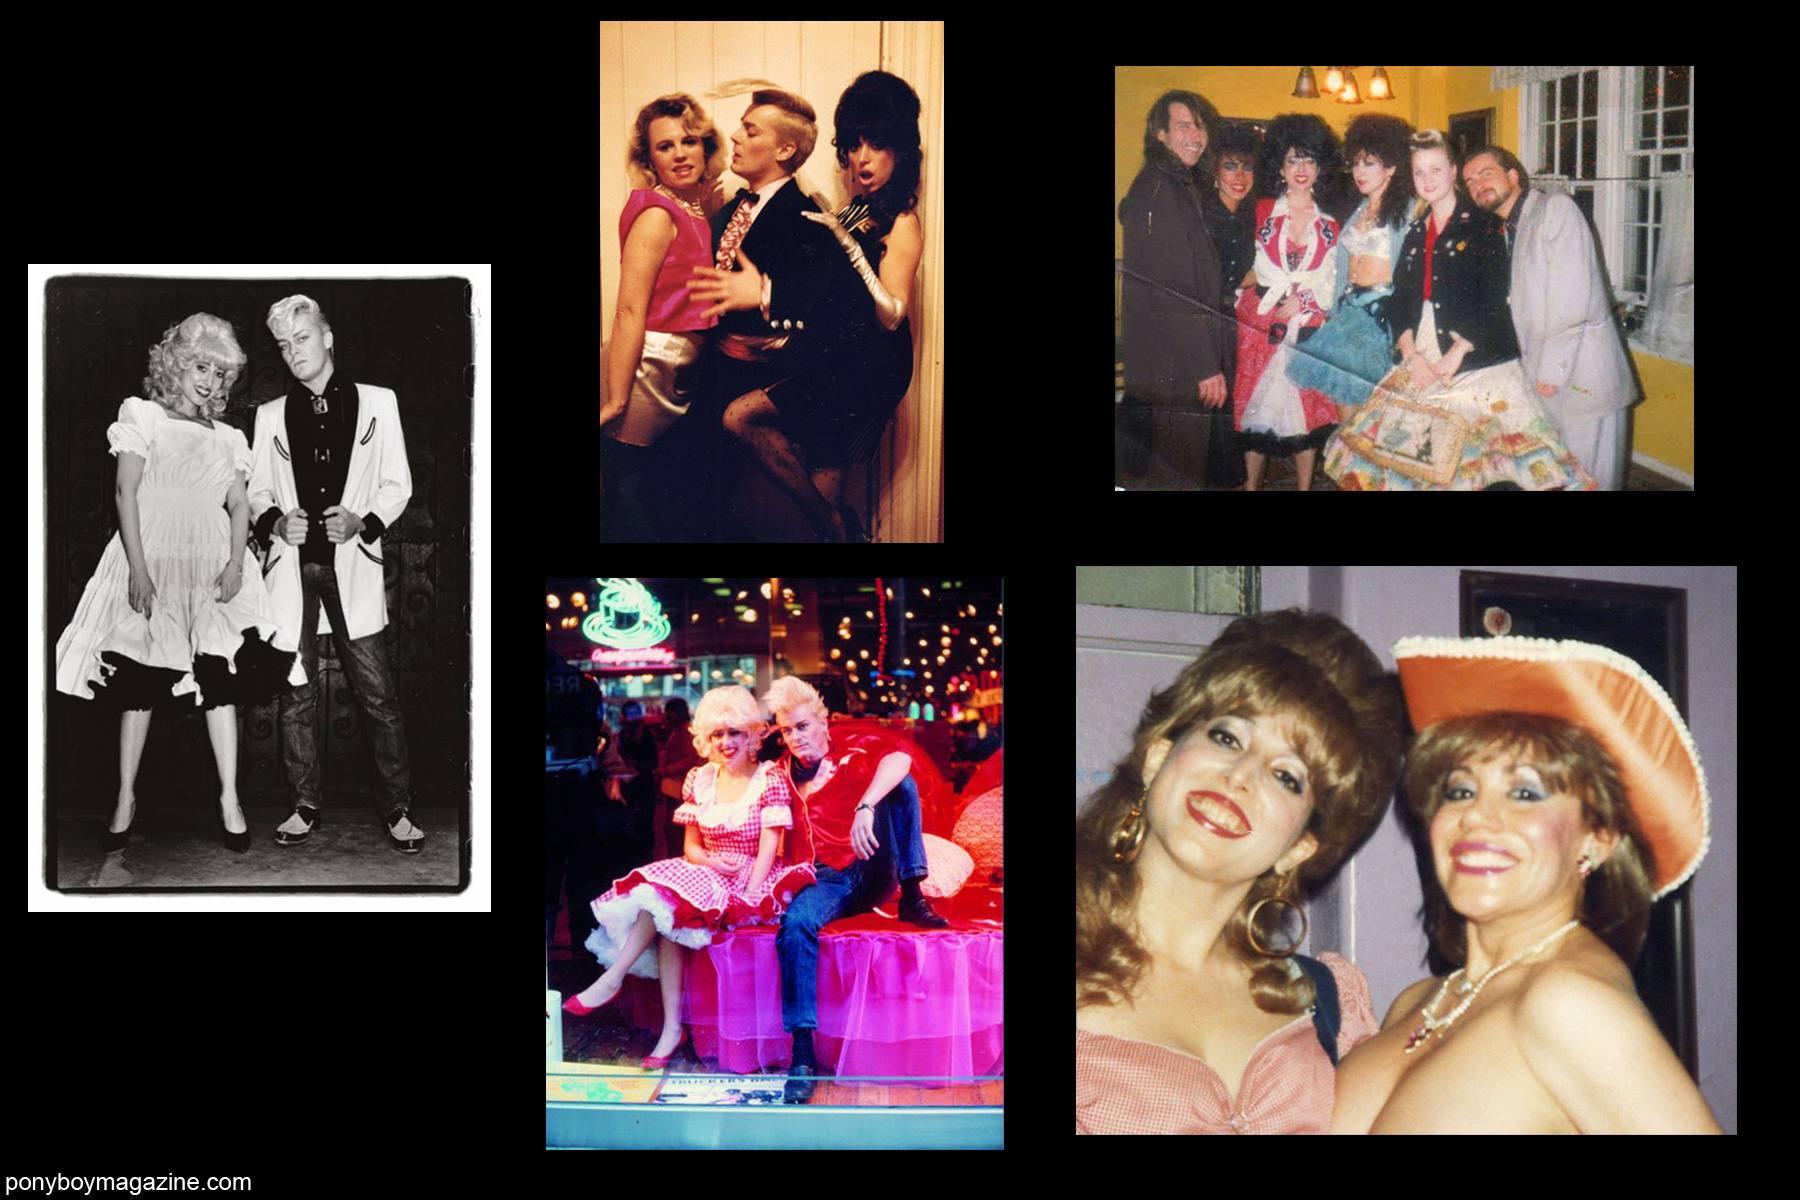 Various old photos of 80's performance artist Katy K with John Sex and Kitten Natividad for Ponyboy Magazine.